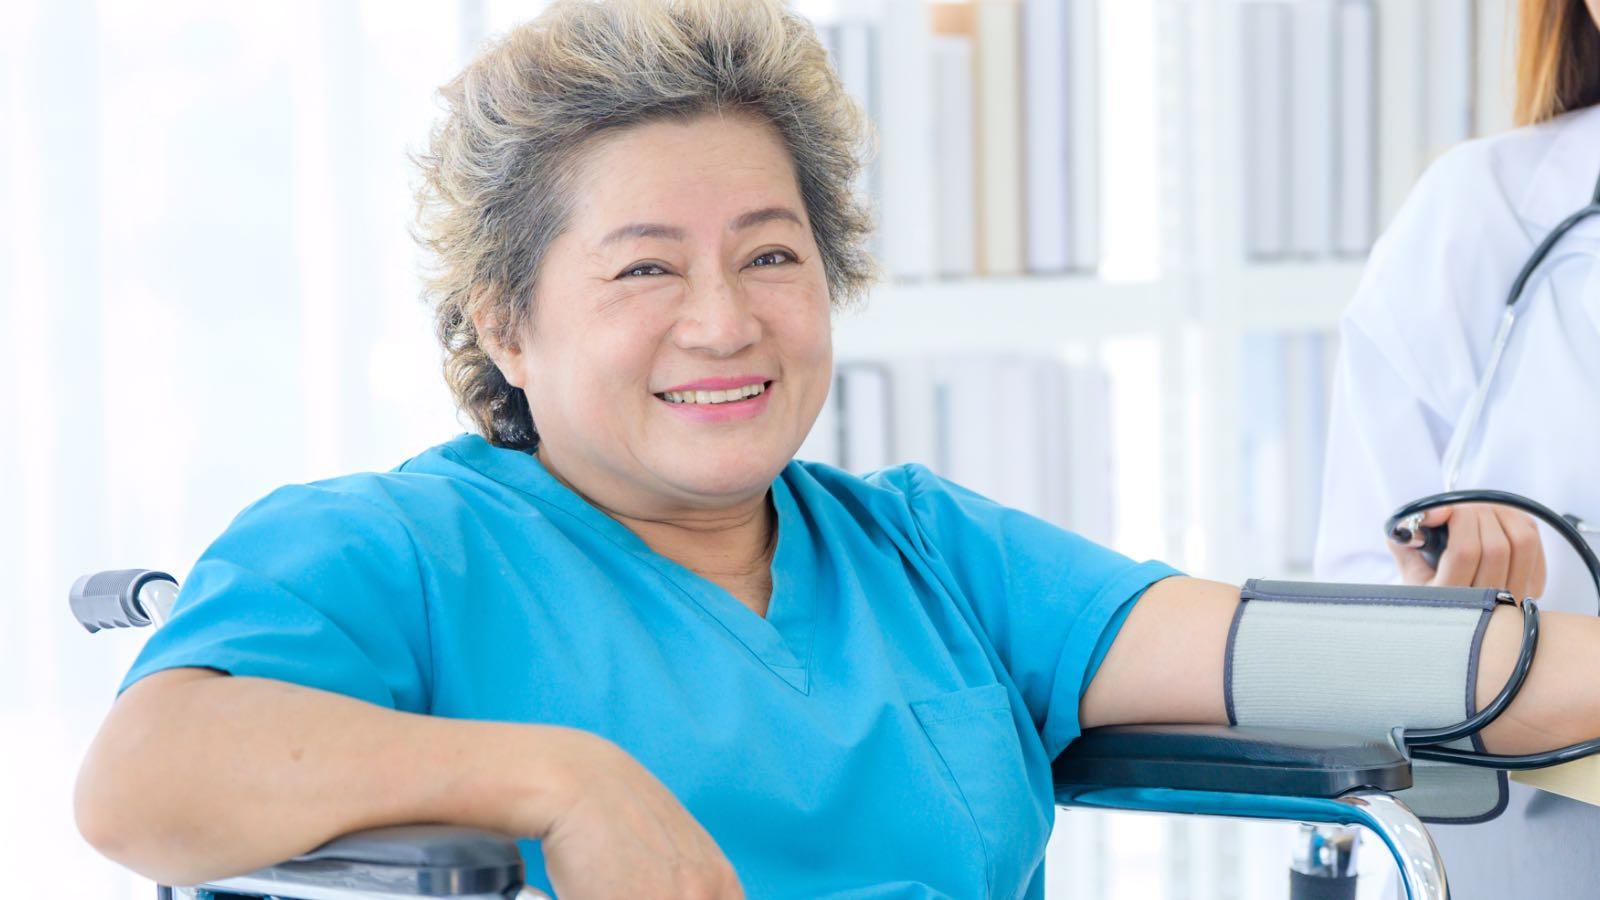 reason for bariatric surgery